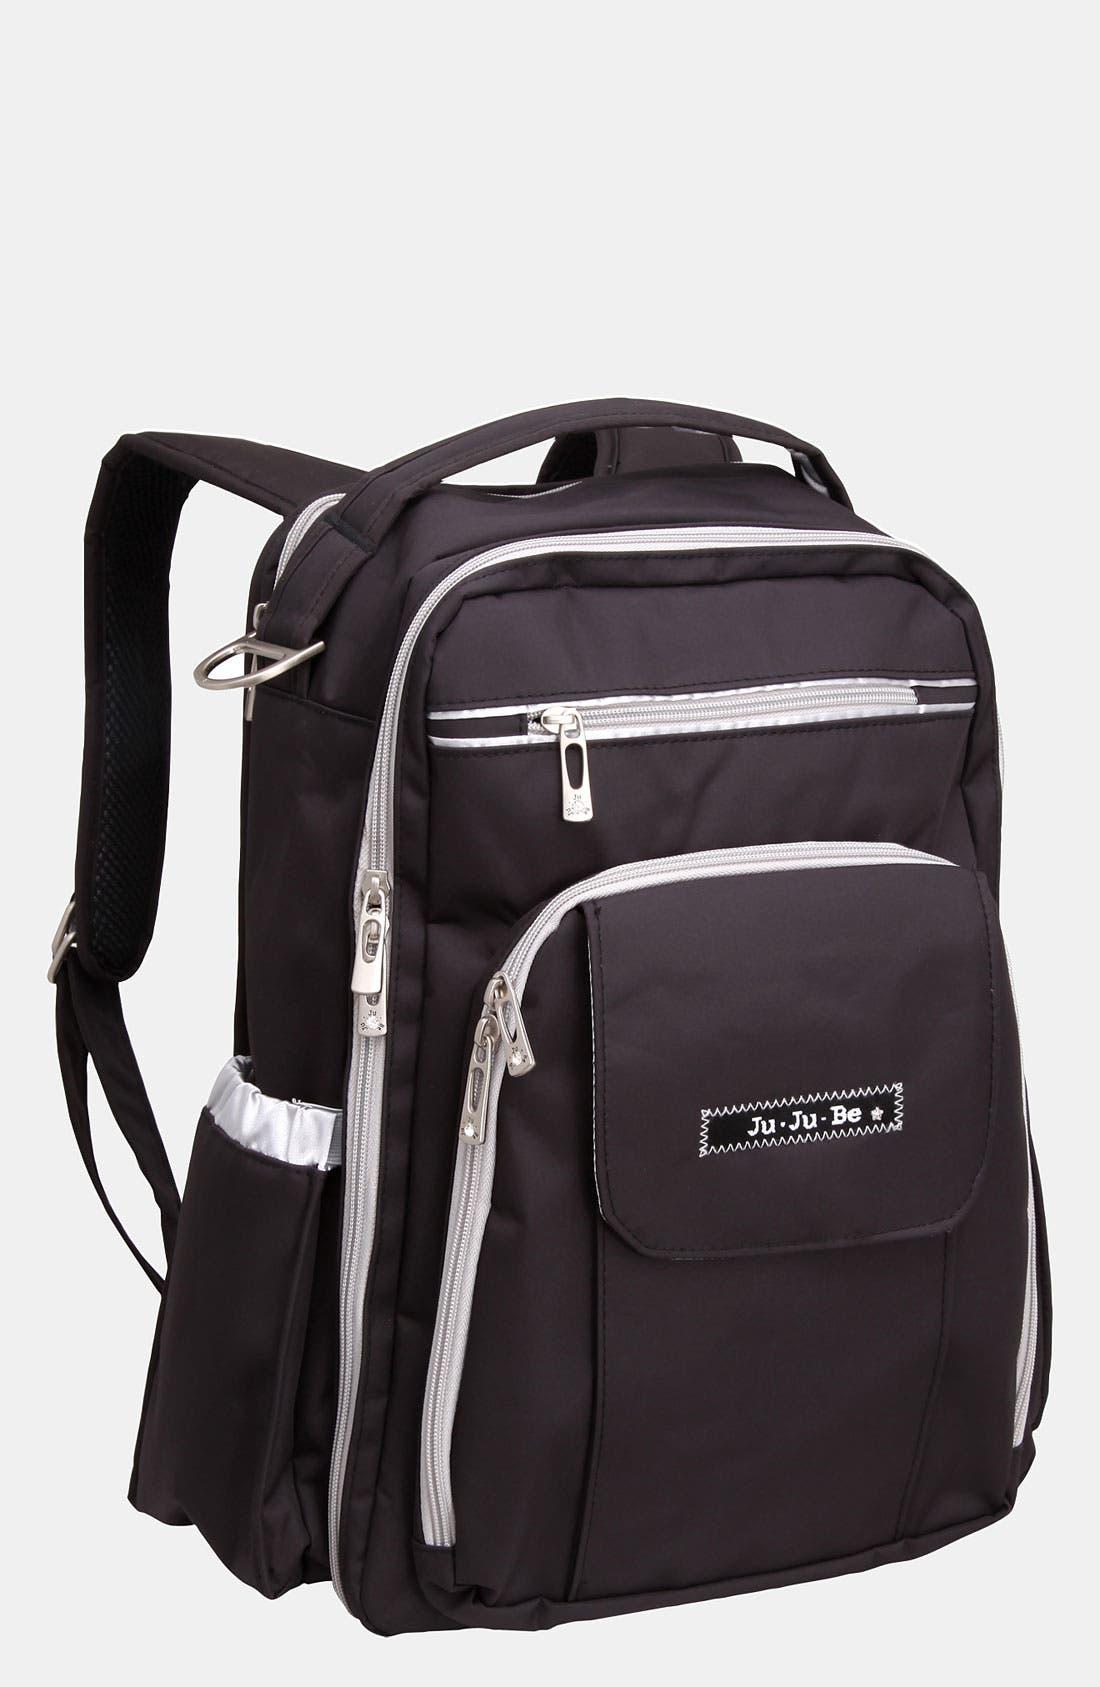 Alternate Image 1 Selected - Ju-Ju-Be 'Be Right Back' Diaper Backpack